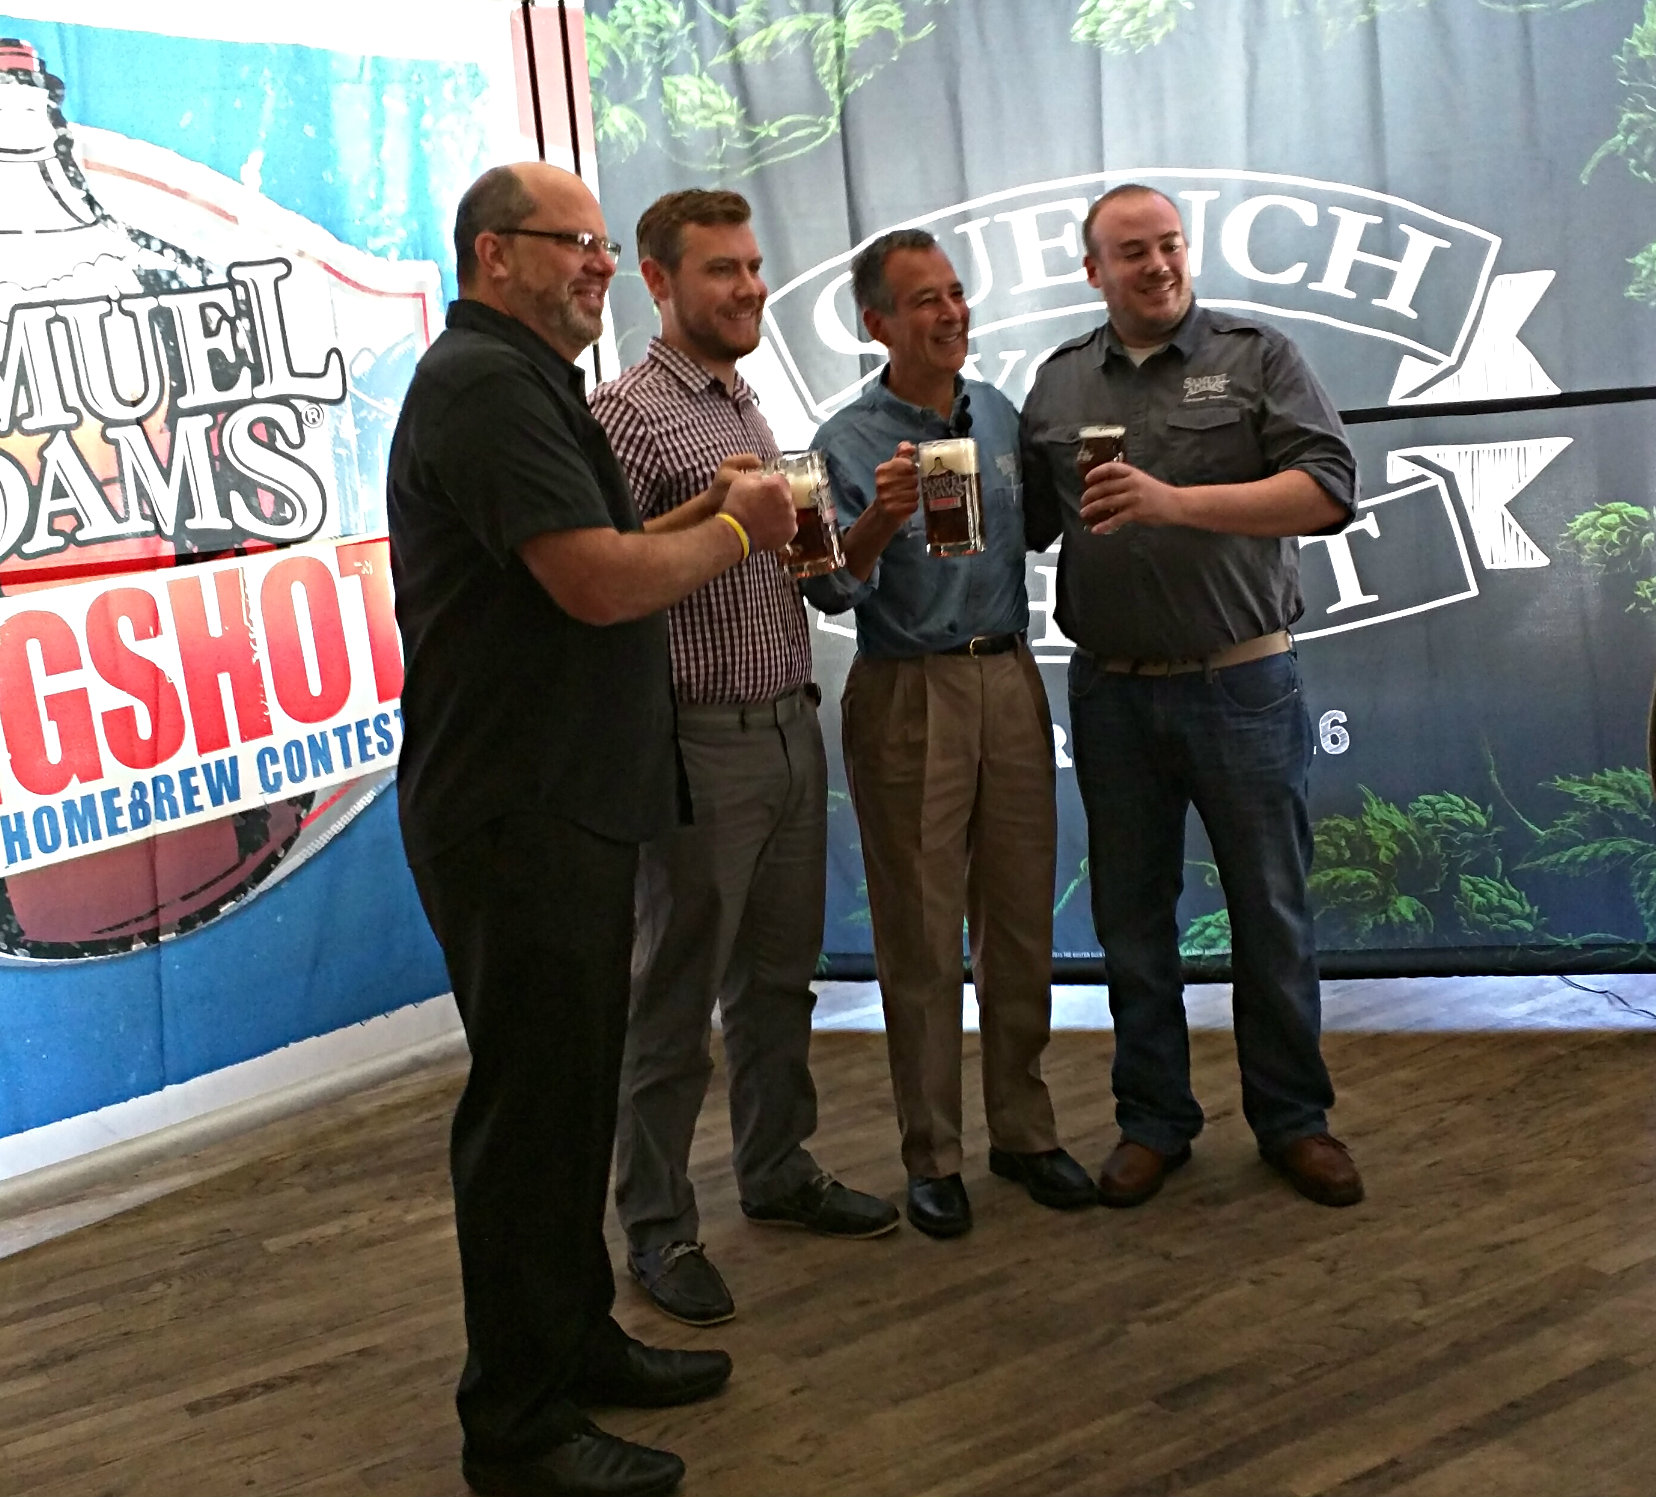 Samuel Adams Jim Koch with the Longshot winners at 2015 GABF.